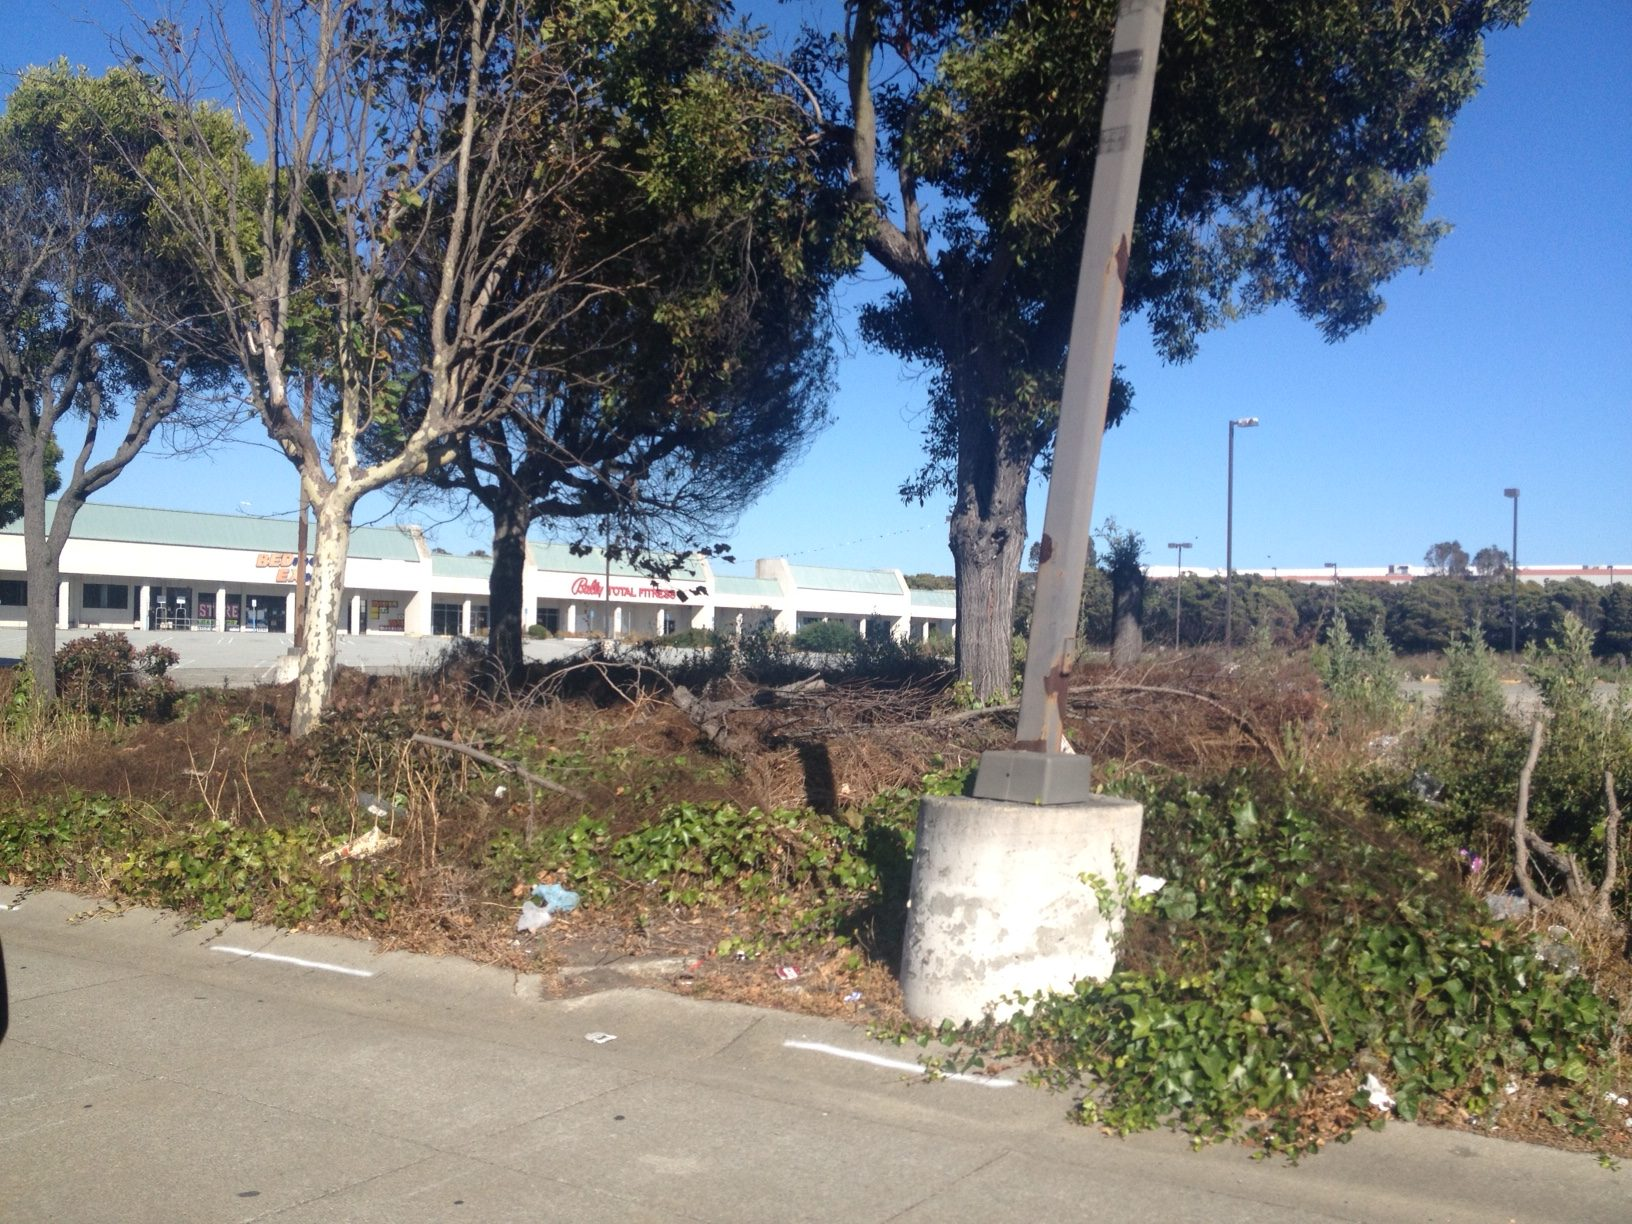 Dead trees, vegetation, and trash blight the abandoned shopping center